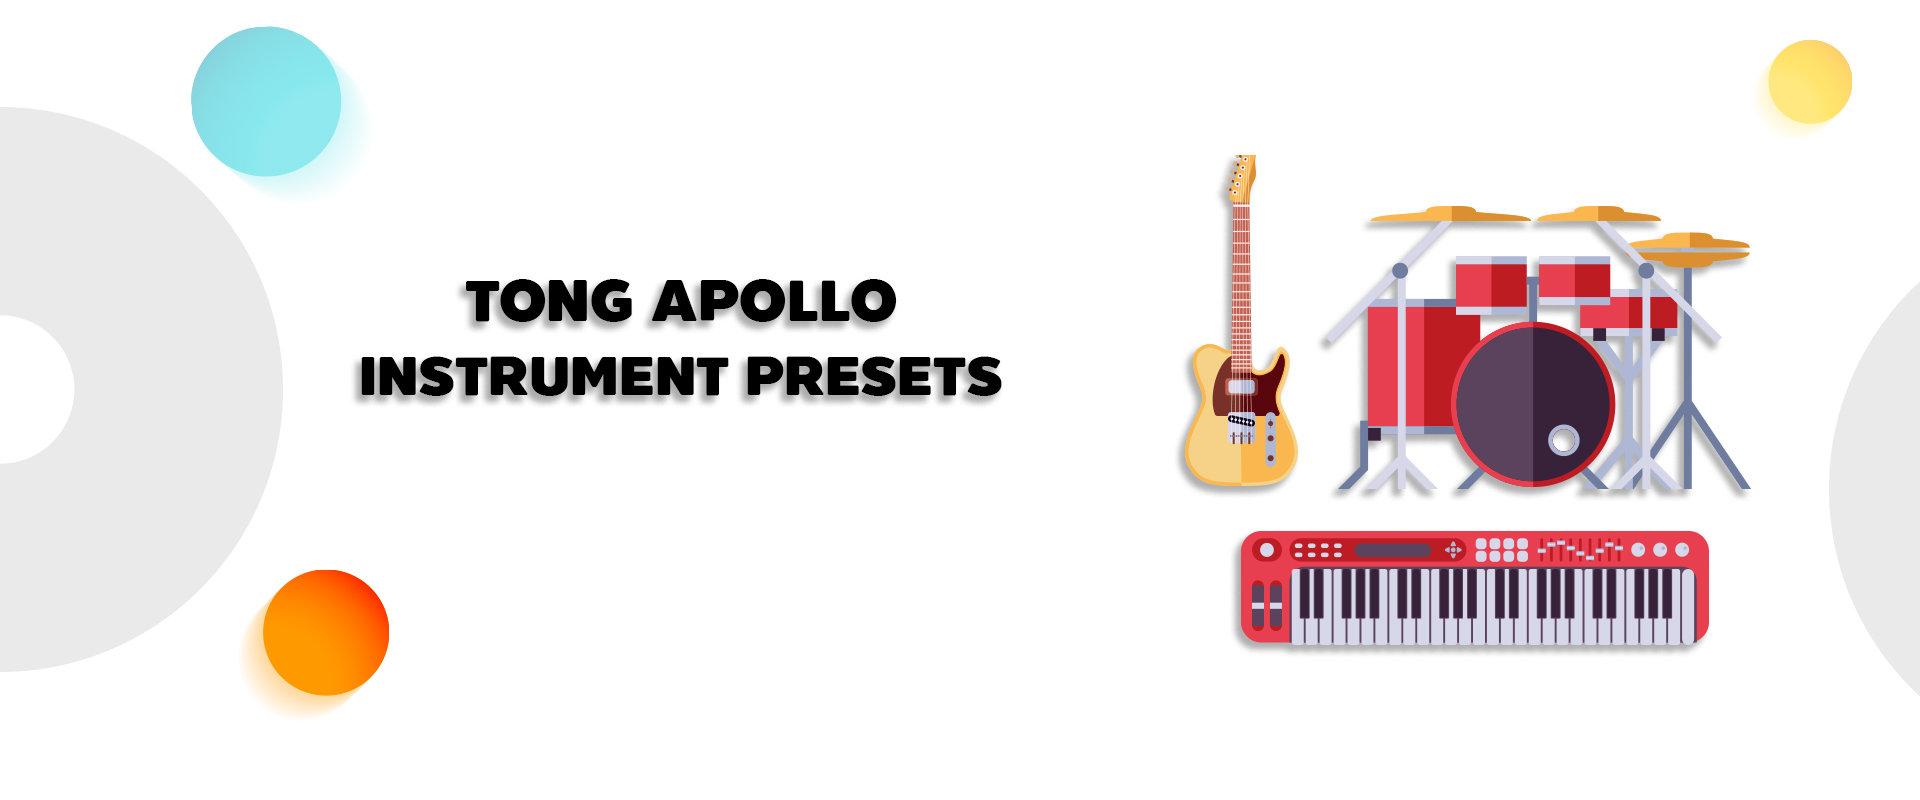 Tong Apollo Instrument Presets Shop.jpg